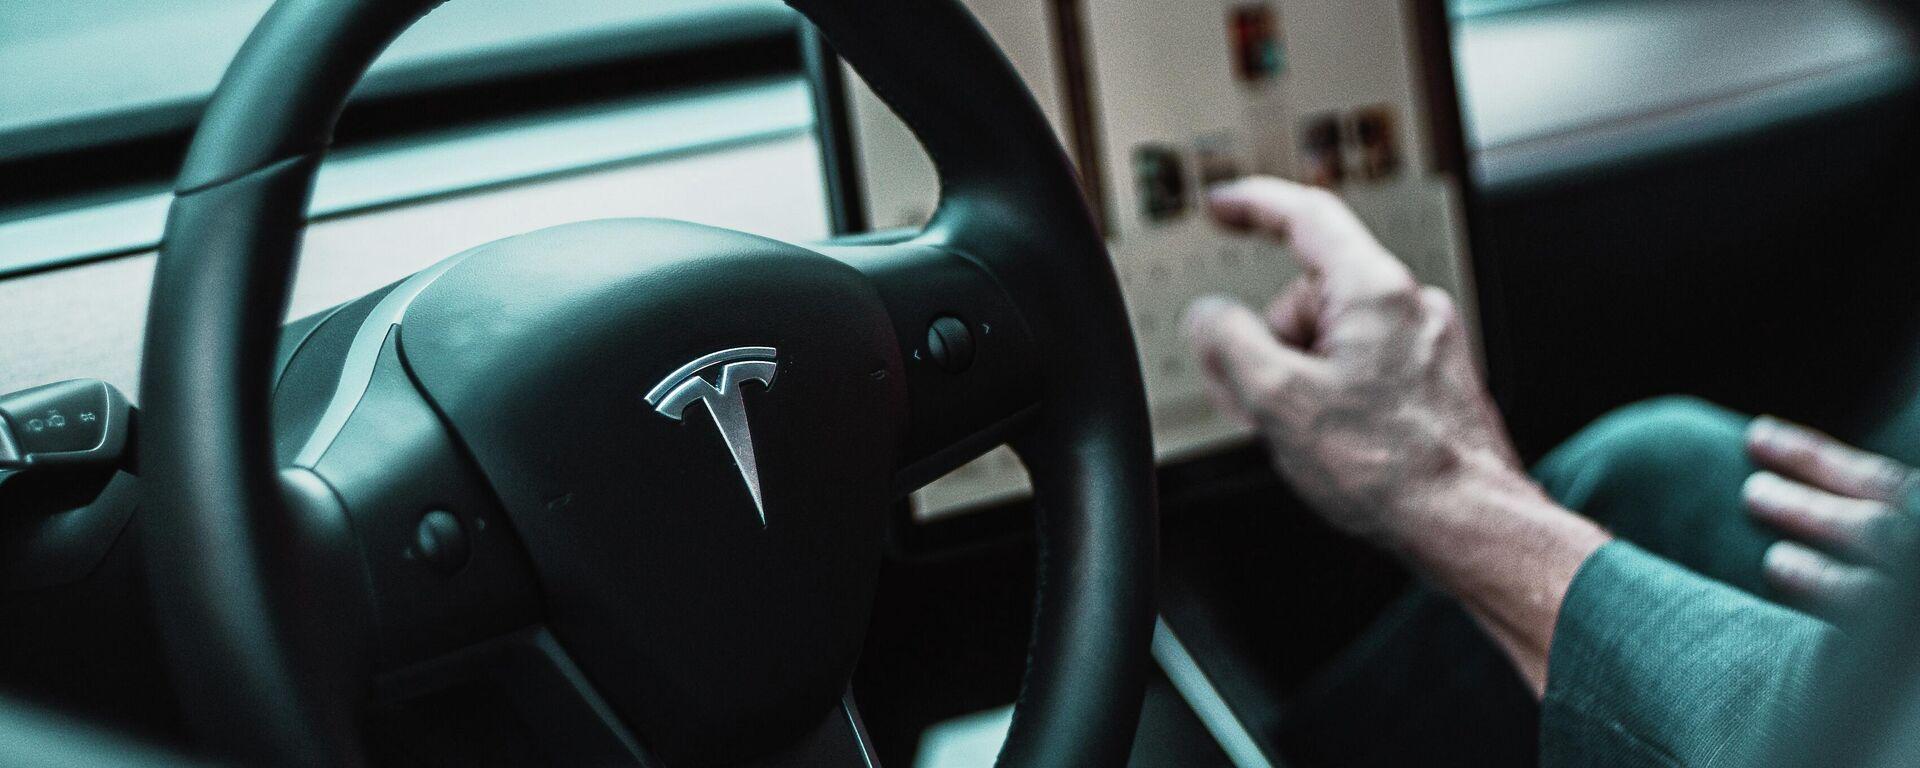 El interior de un automóvil de Tesla - Sputnik Mundo, 1920, 28.07.2021